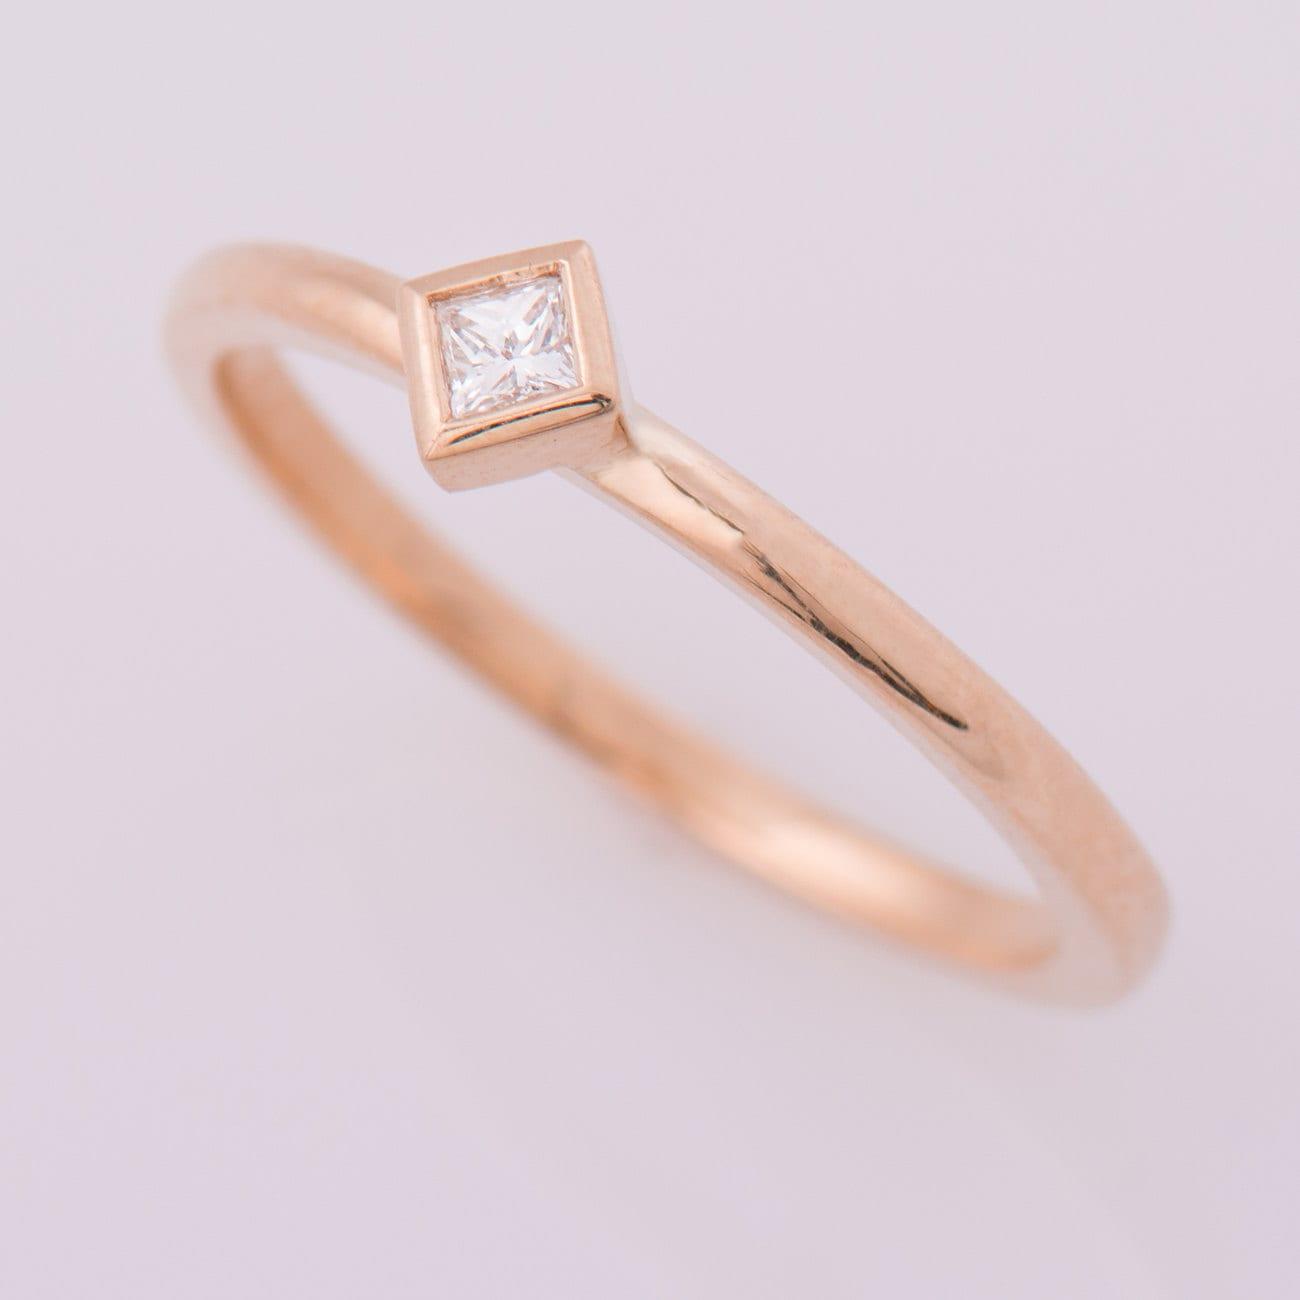 Princess Cut Diamond Ring Square Diamond Ring 14k Rose Gold Etsy